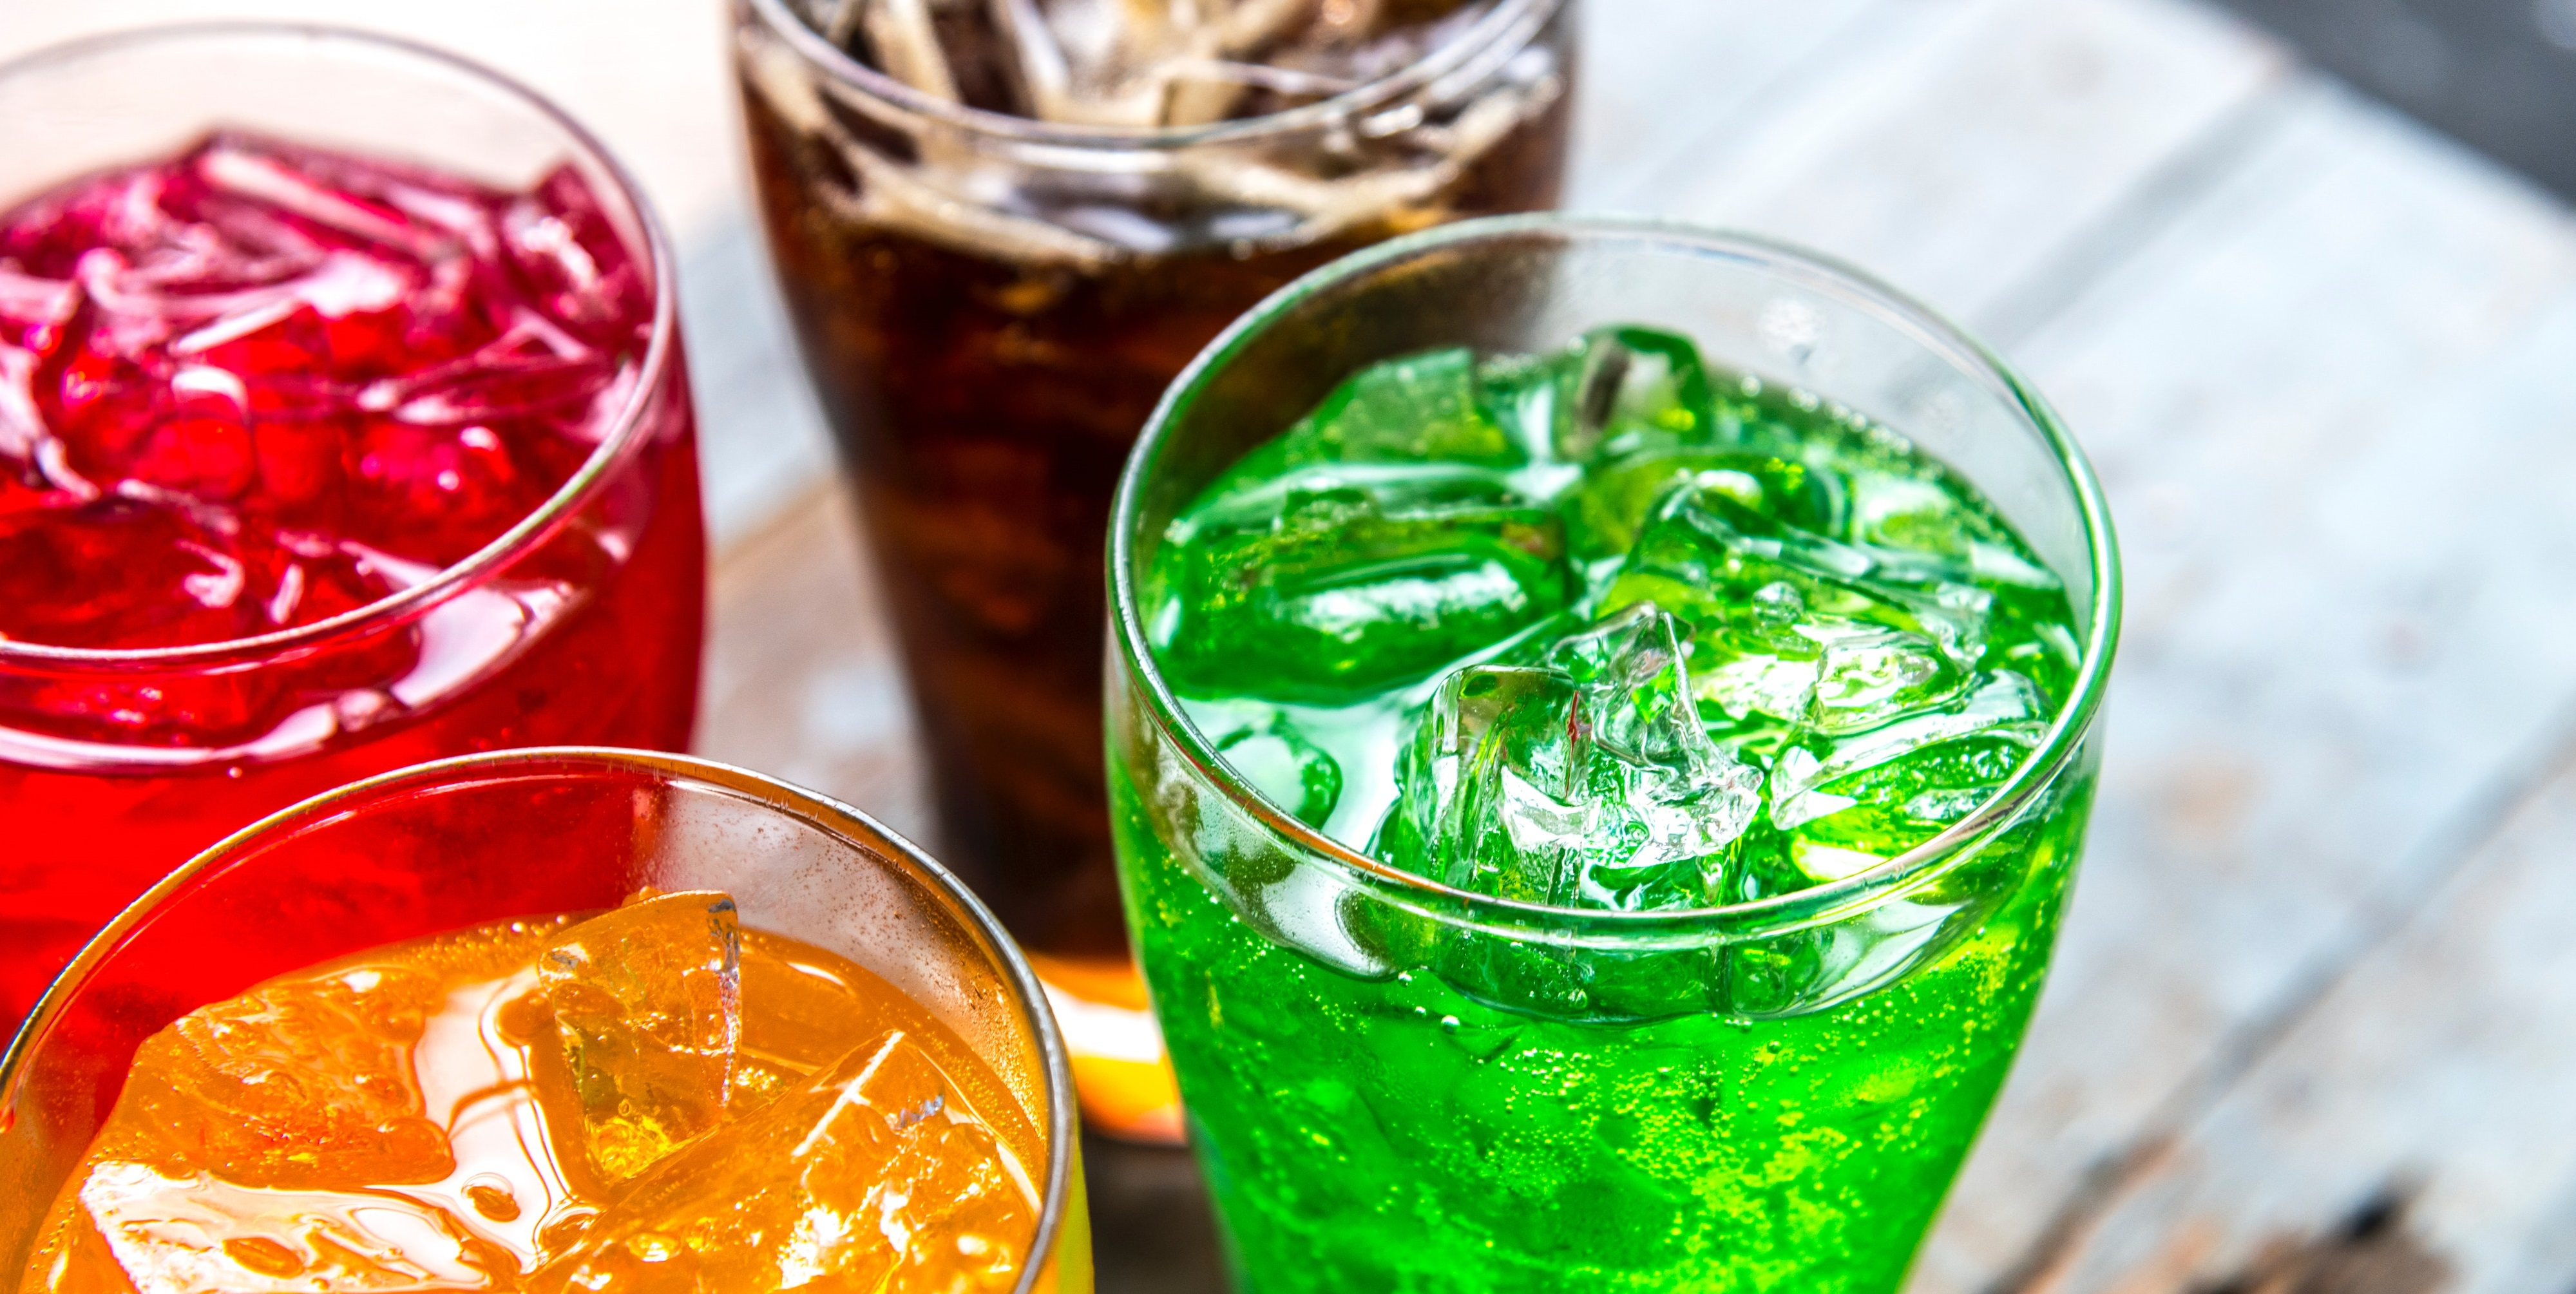 beverages-carbonated-carbonated-drink-1282273